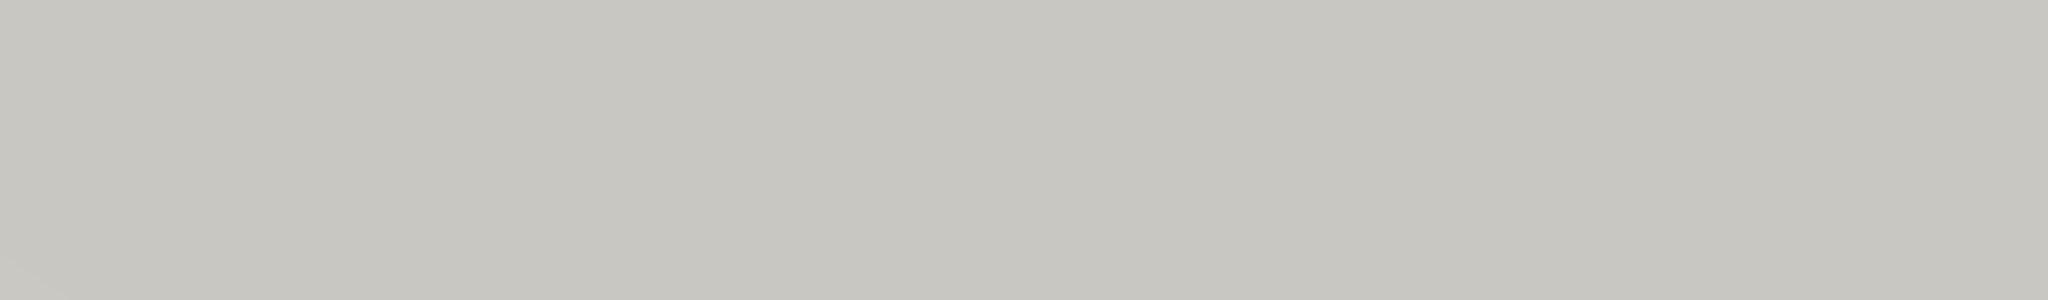 HU 12611 canto ABS beige liso mate